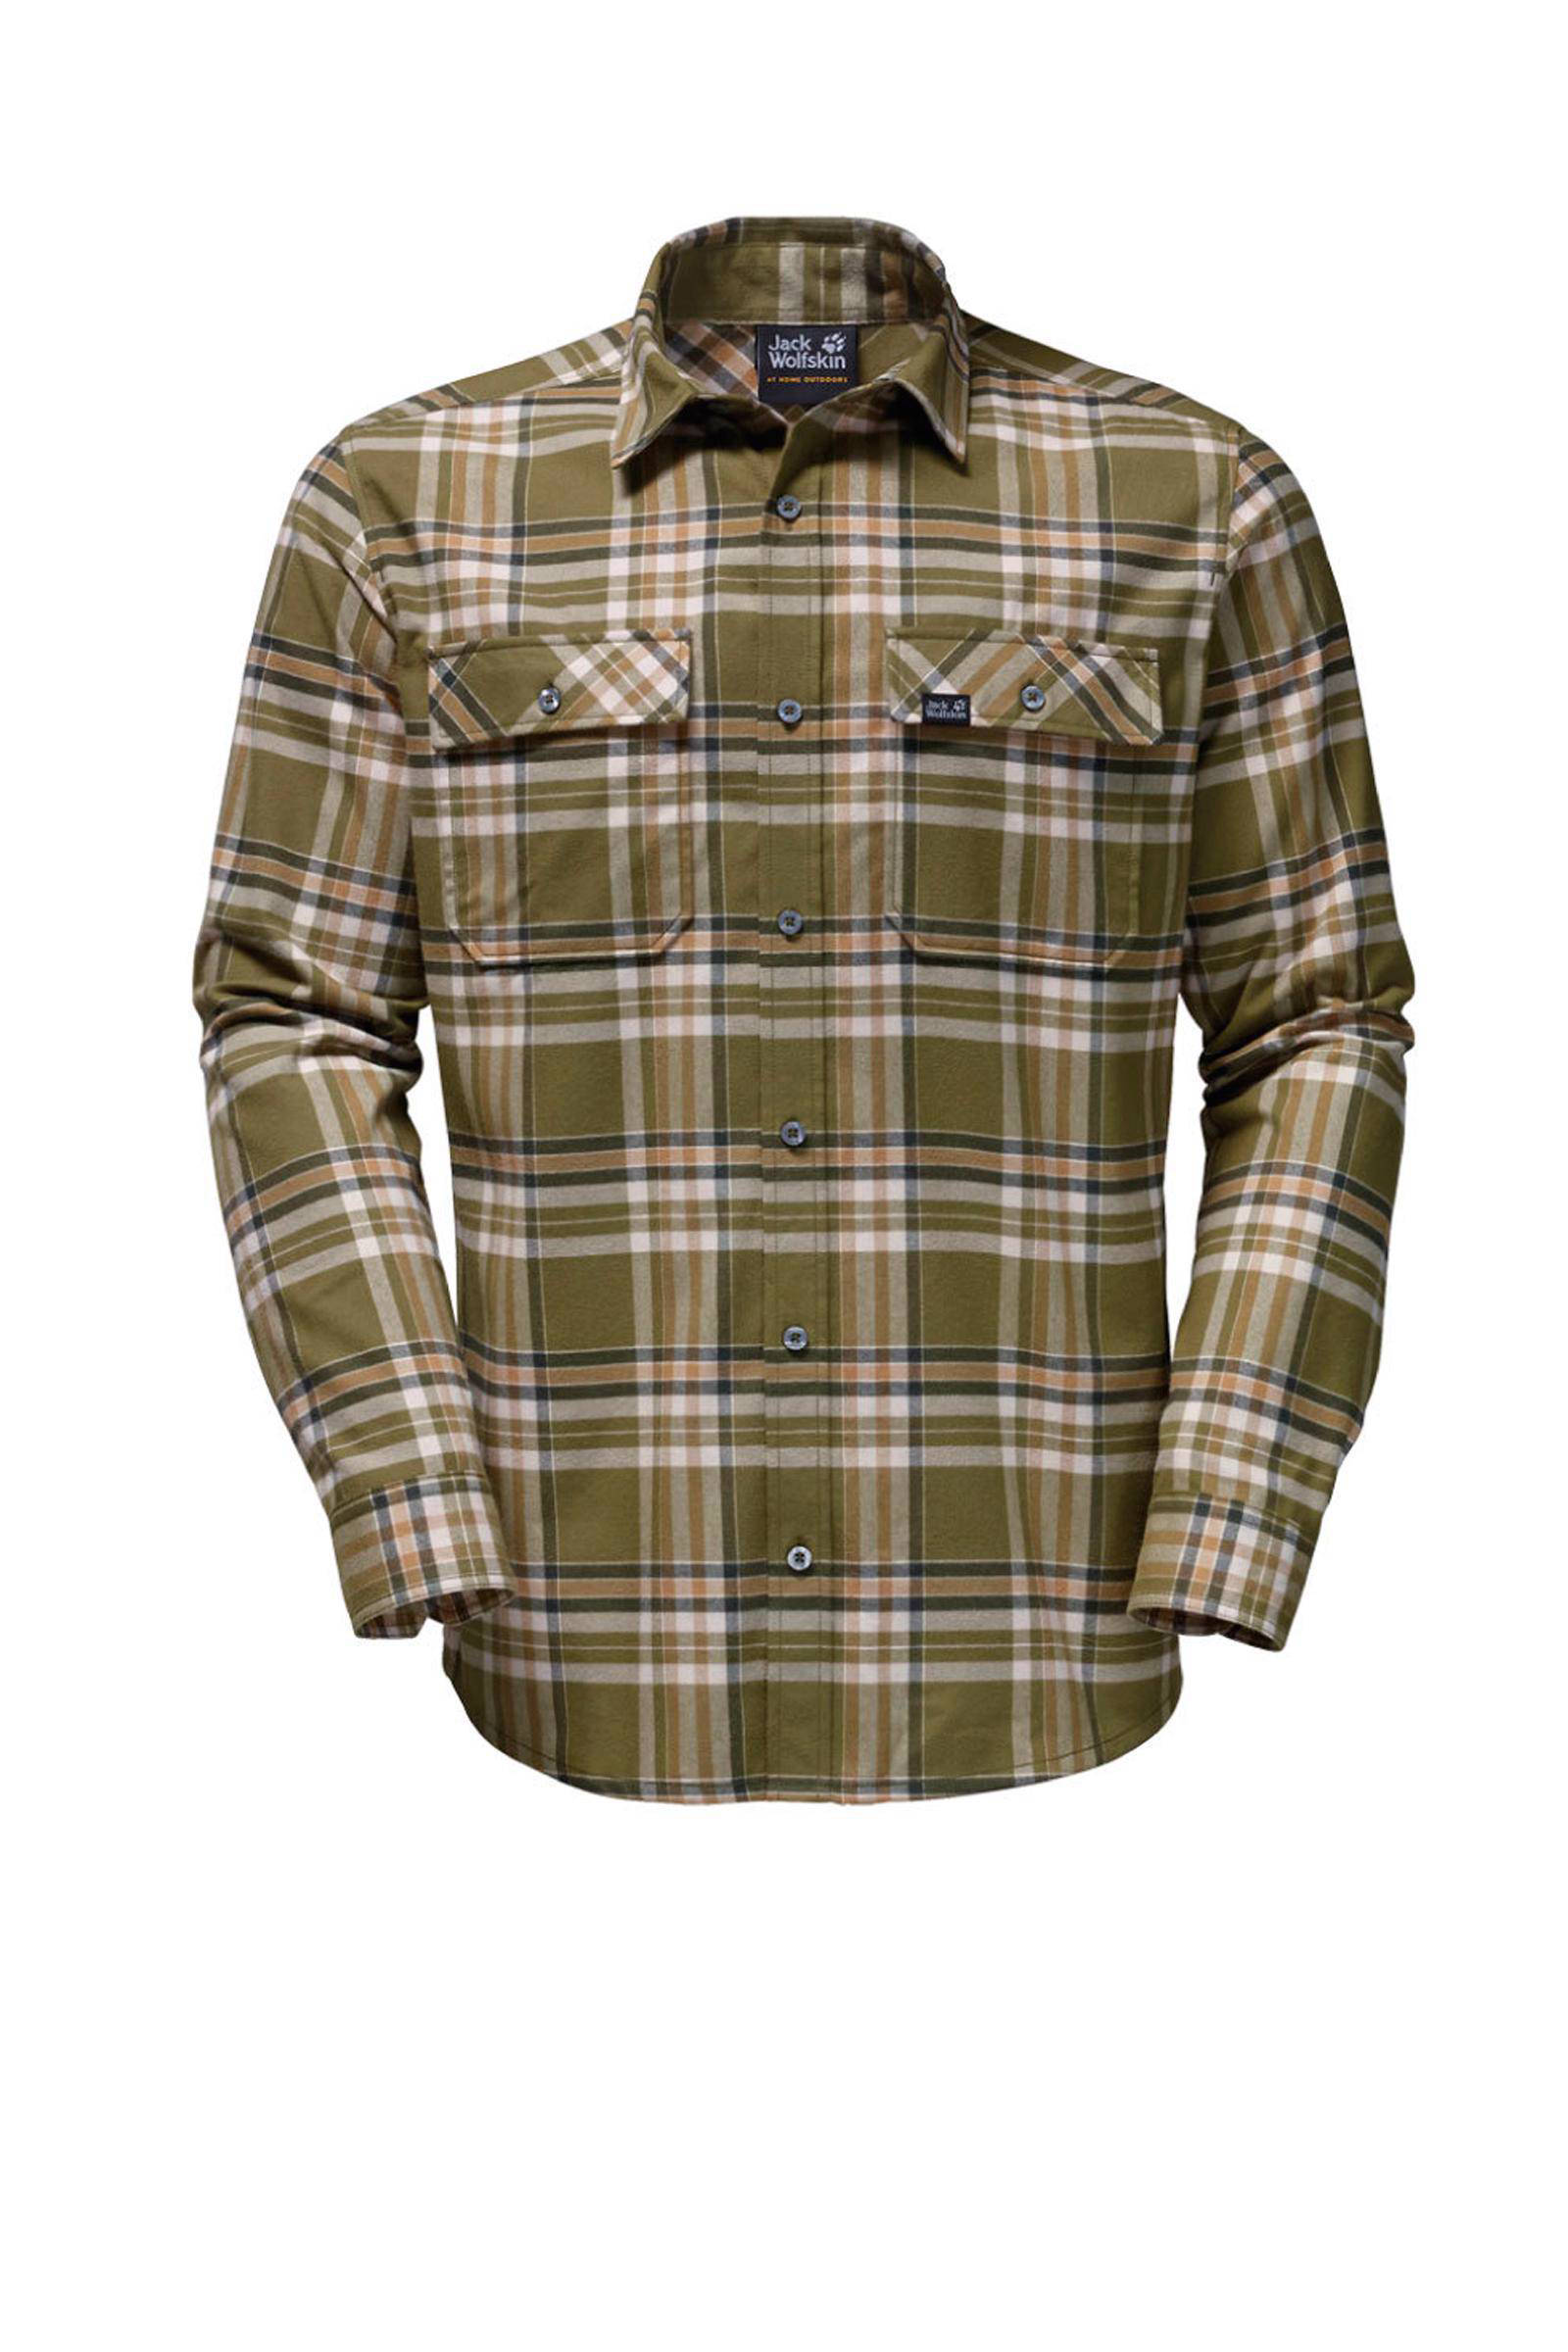 flanellen Jack Wolfskin Valley overhemd outdoor AwT6qx